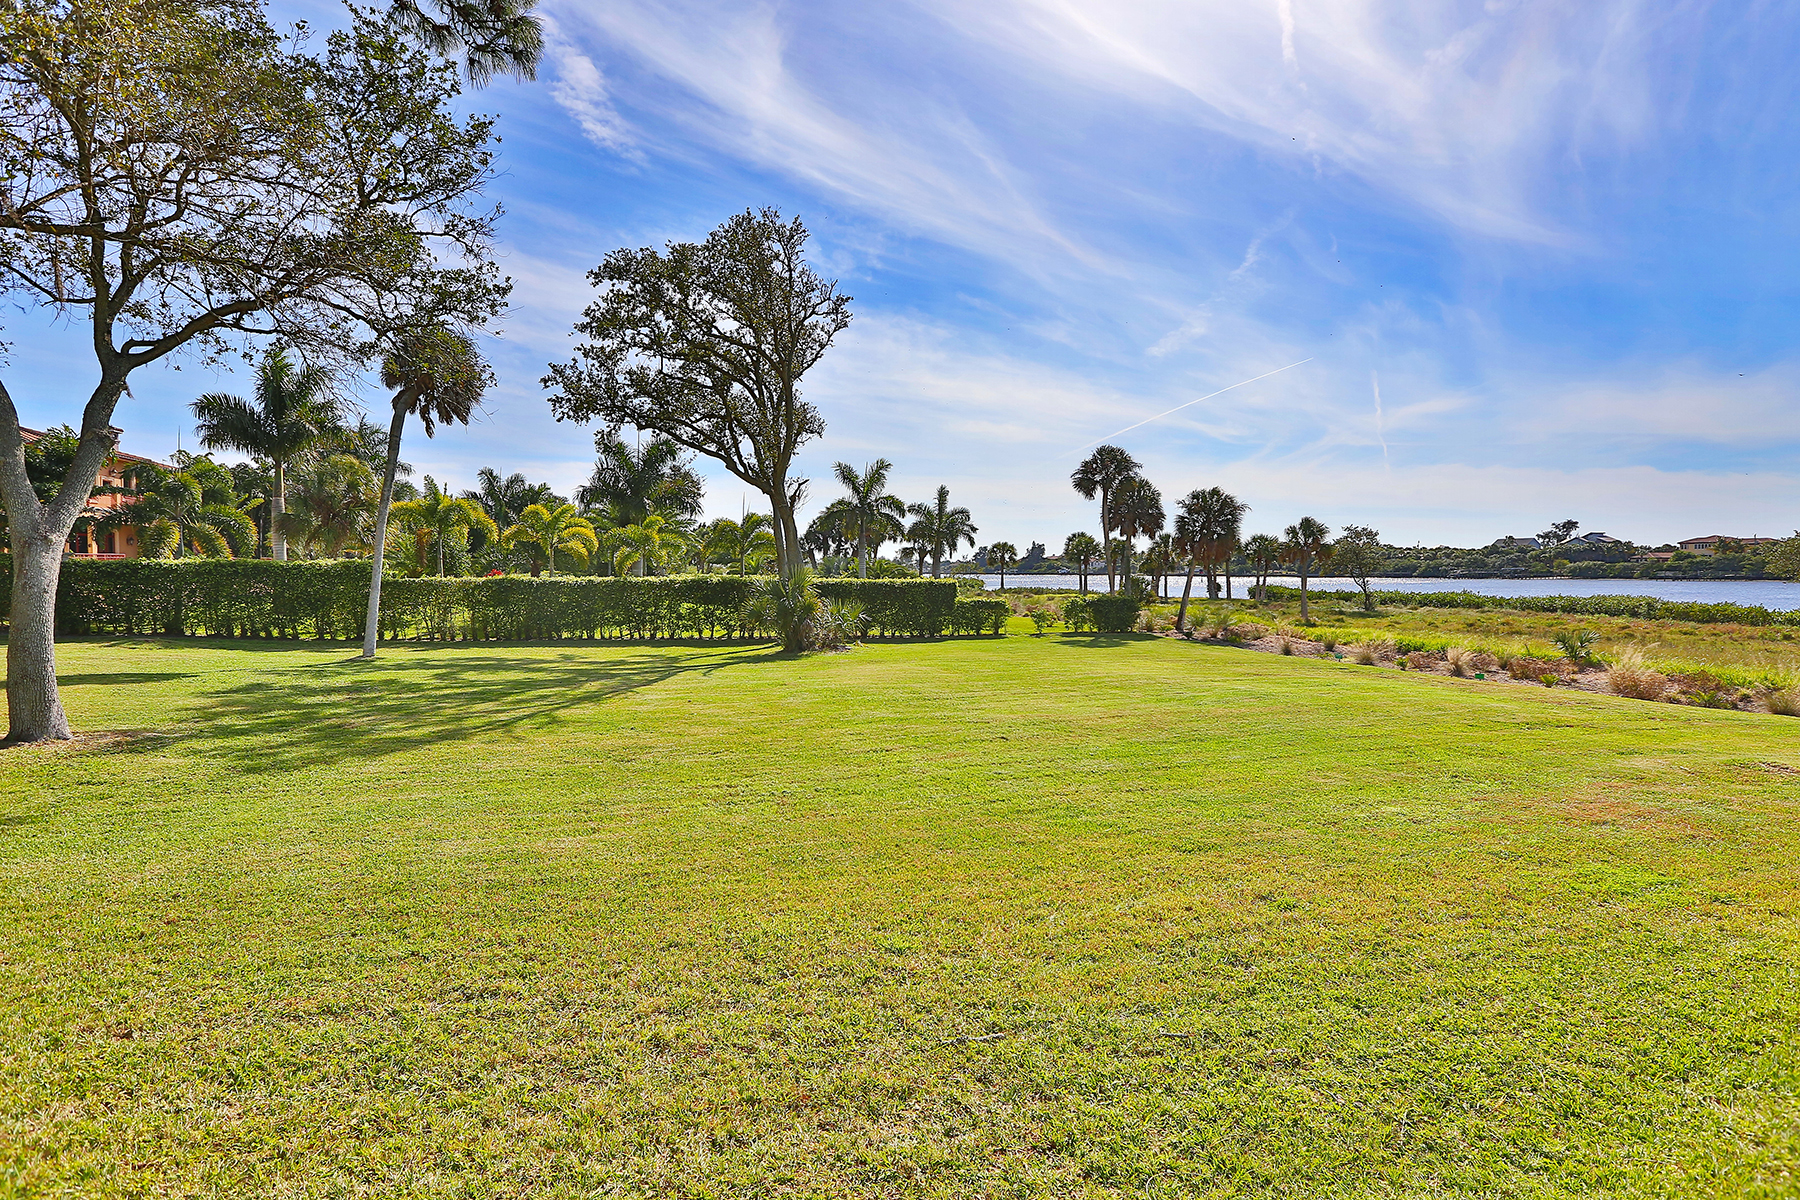 Land for Sale at LEMON BAY ESTATES 5840 Jamila River Dr 8 Venice, Florida 34293 United States